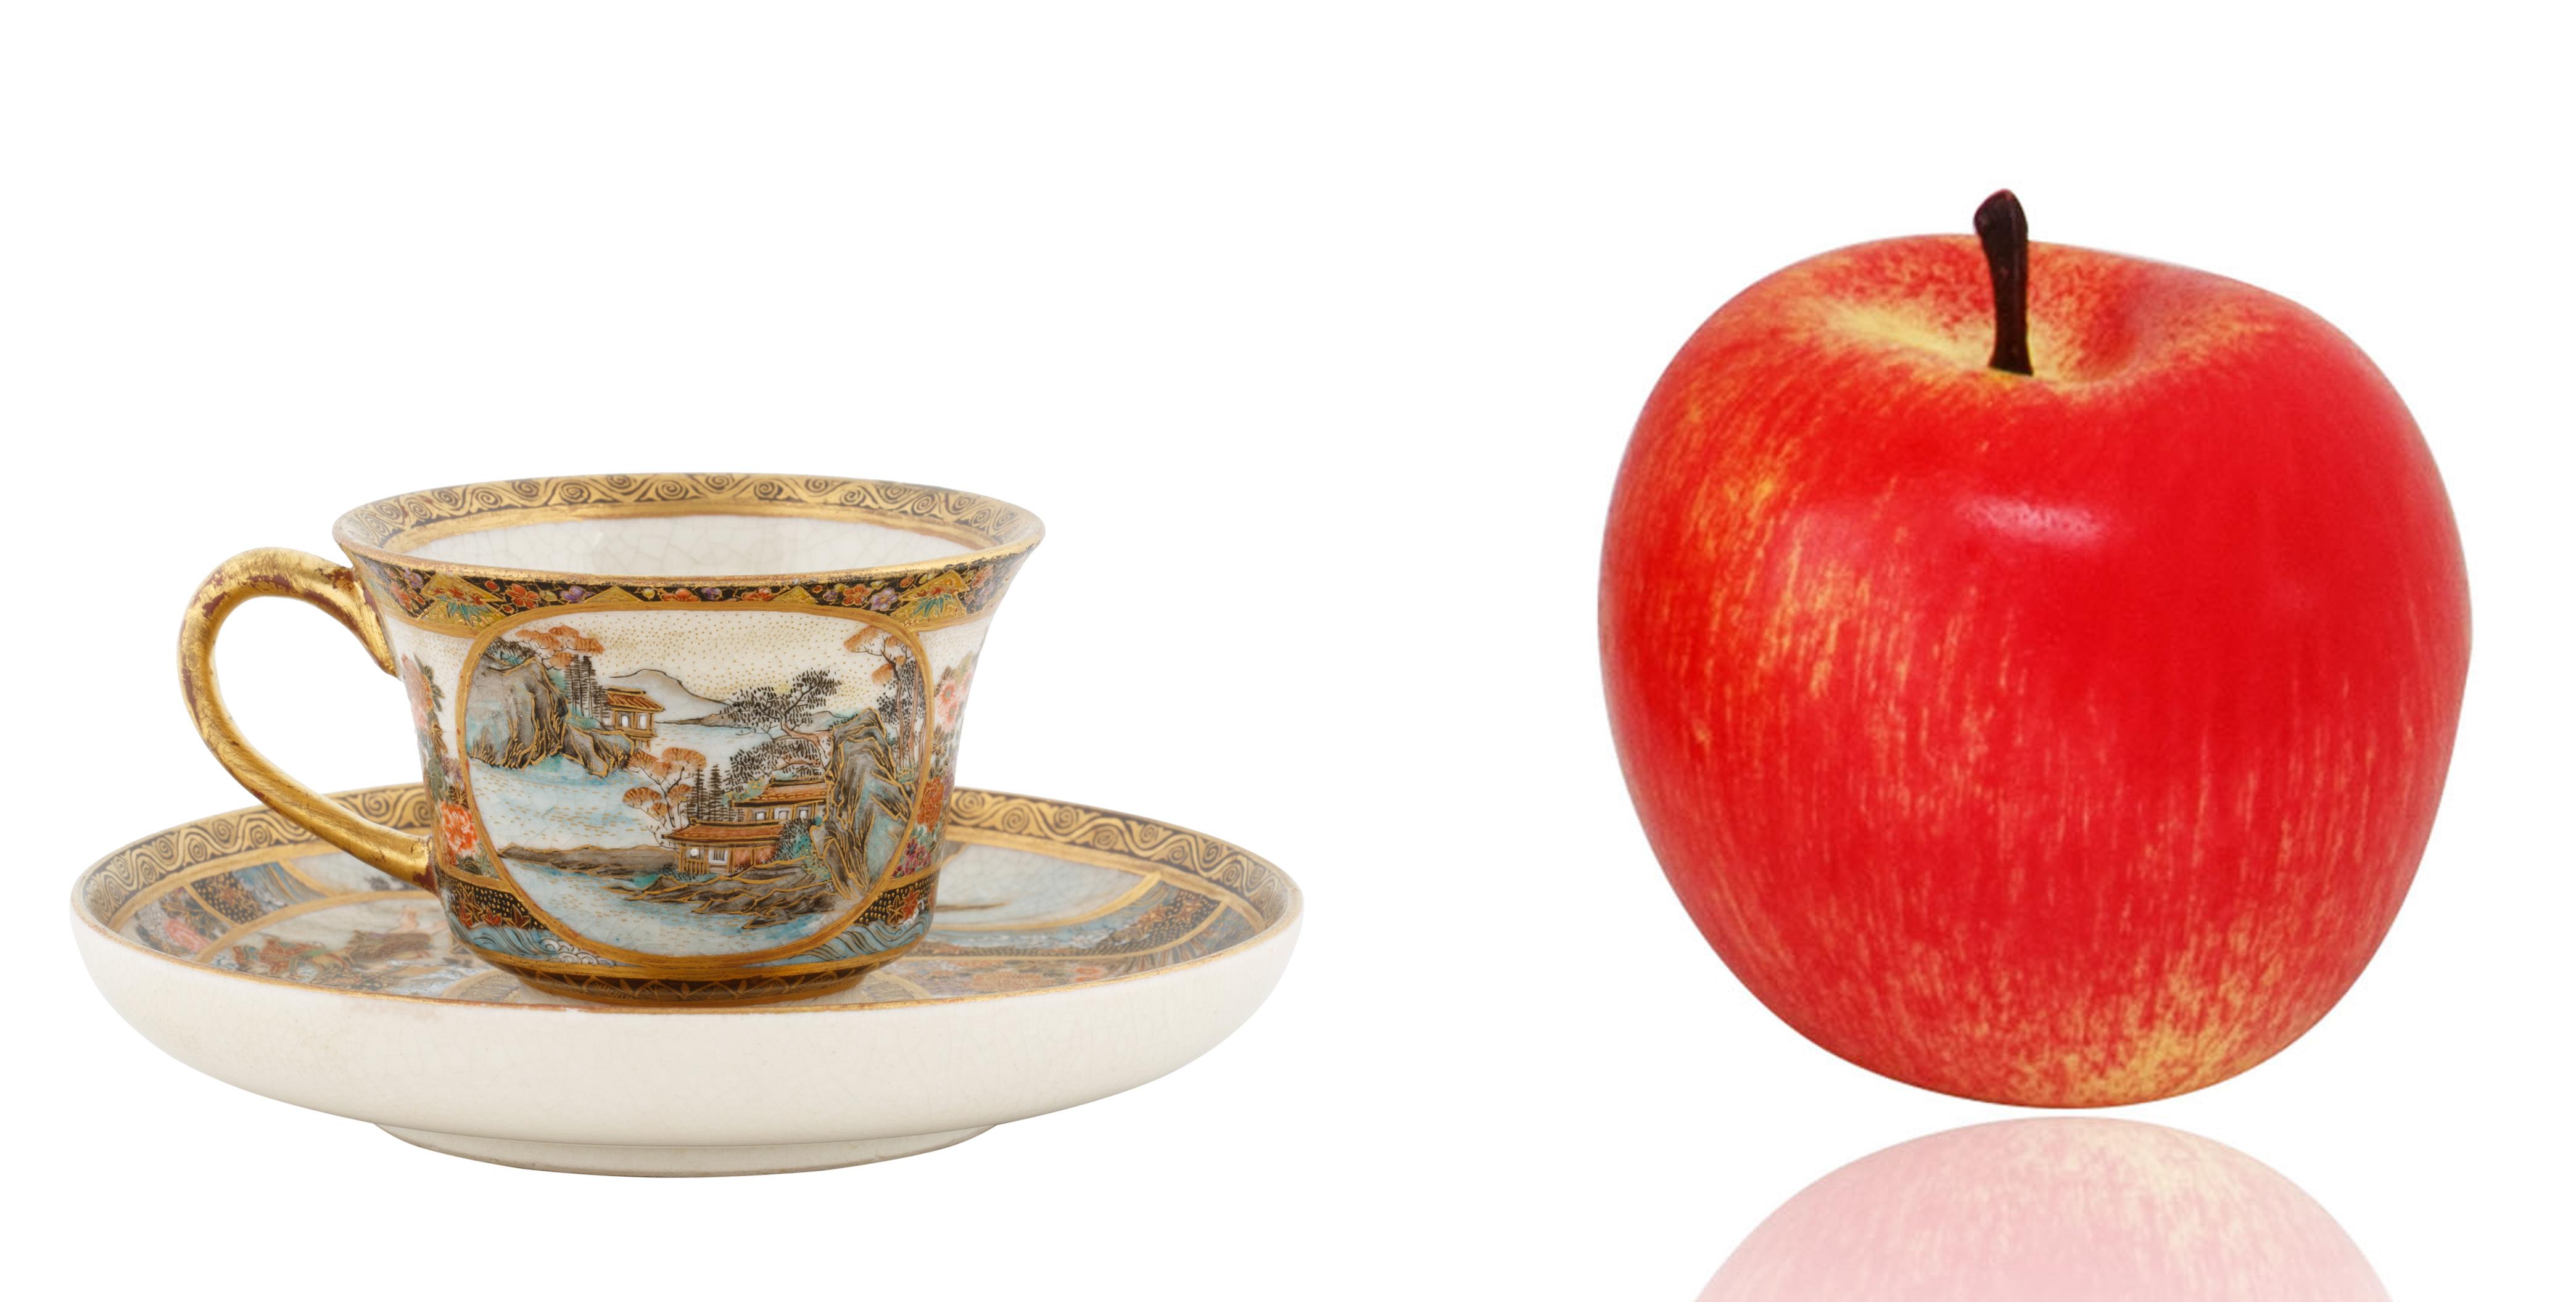 19TH CENTURY SATSUMA PORCELAIN TEA CUP AND SAUCER - Image 7 of 7